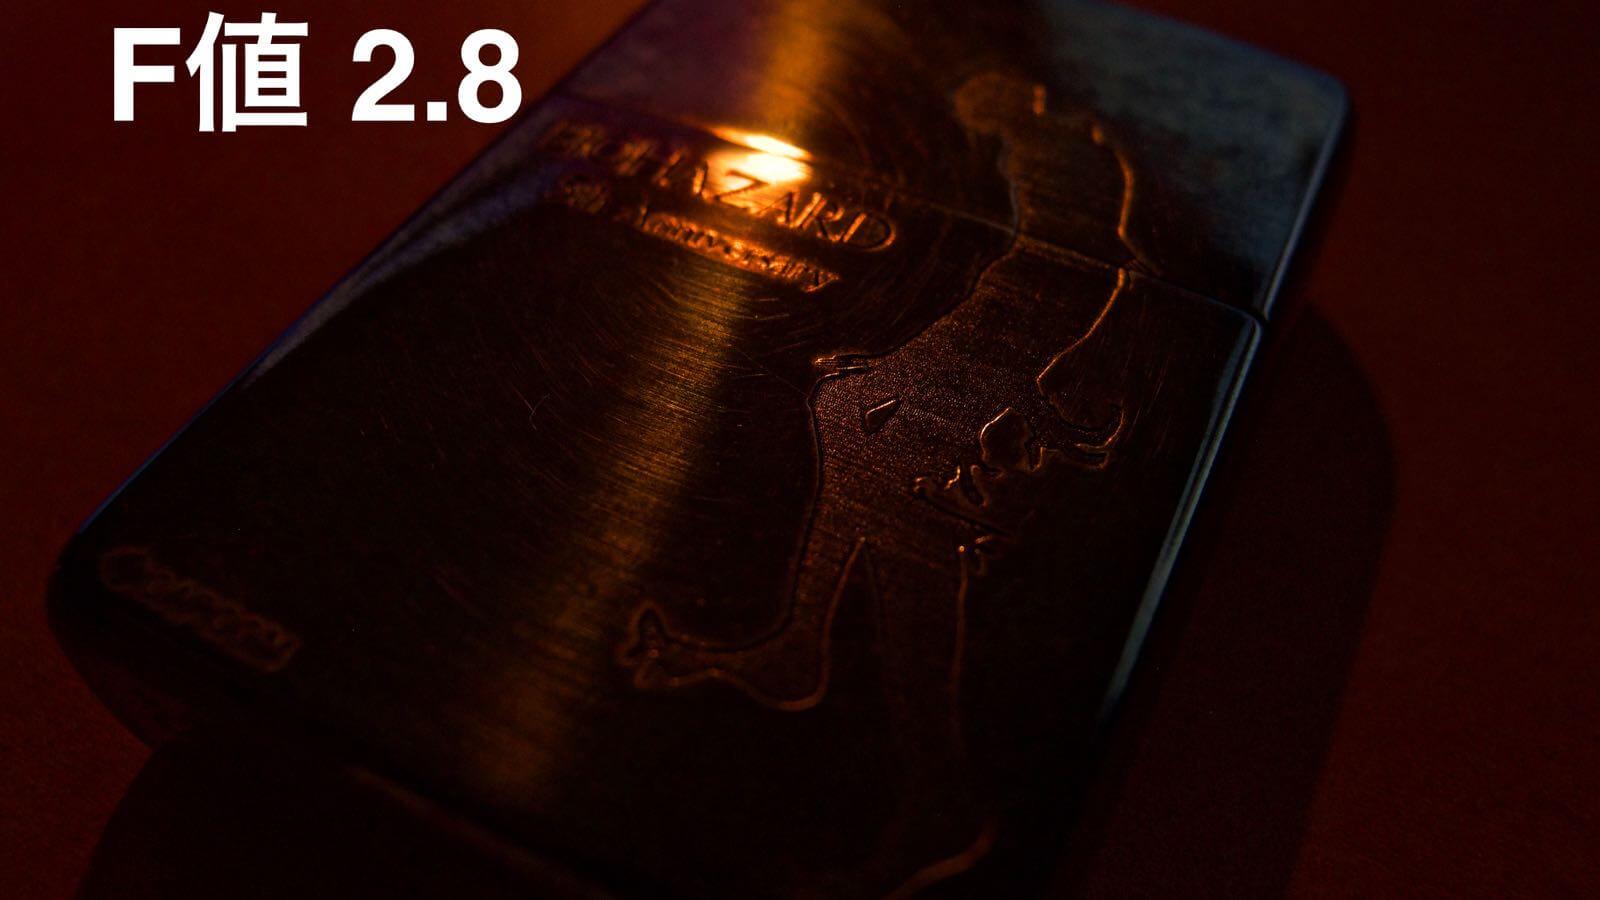 0064 Olympus XZ 1 Review 04